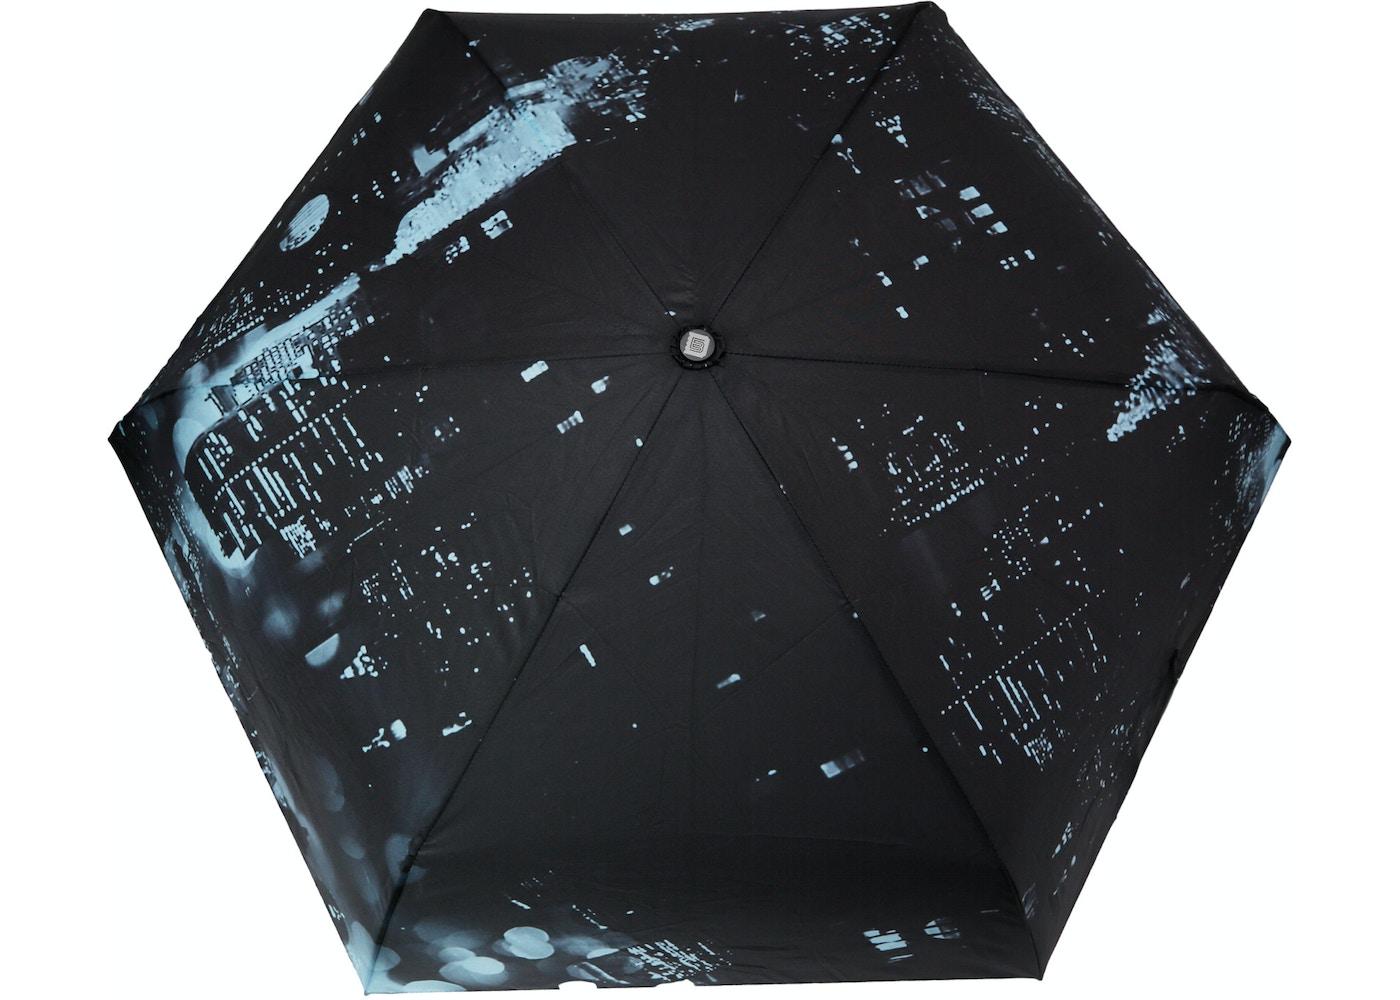 Extra Butter The North Face Nightcrawlers Shedrain Umbrella Multi - FW18 c000ff743